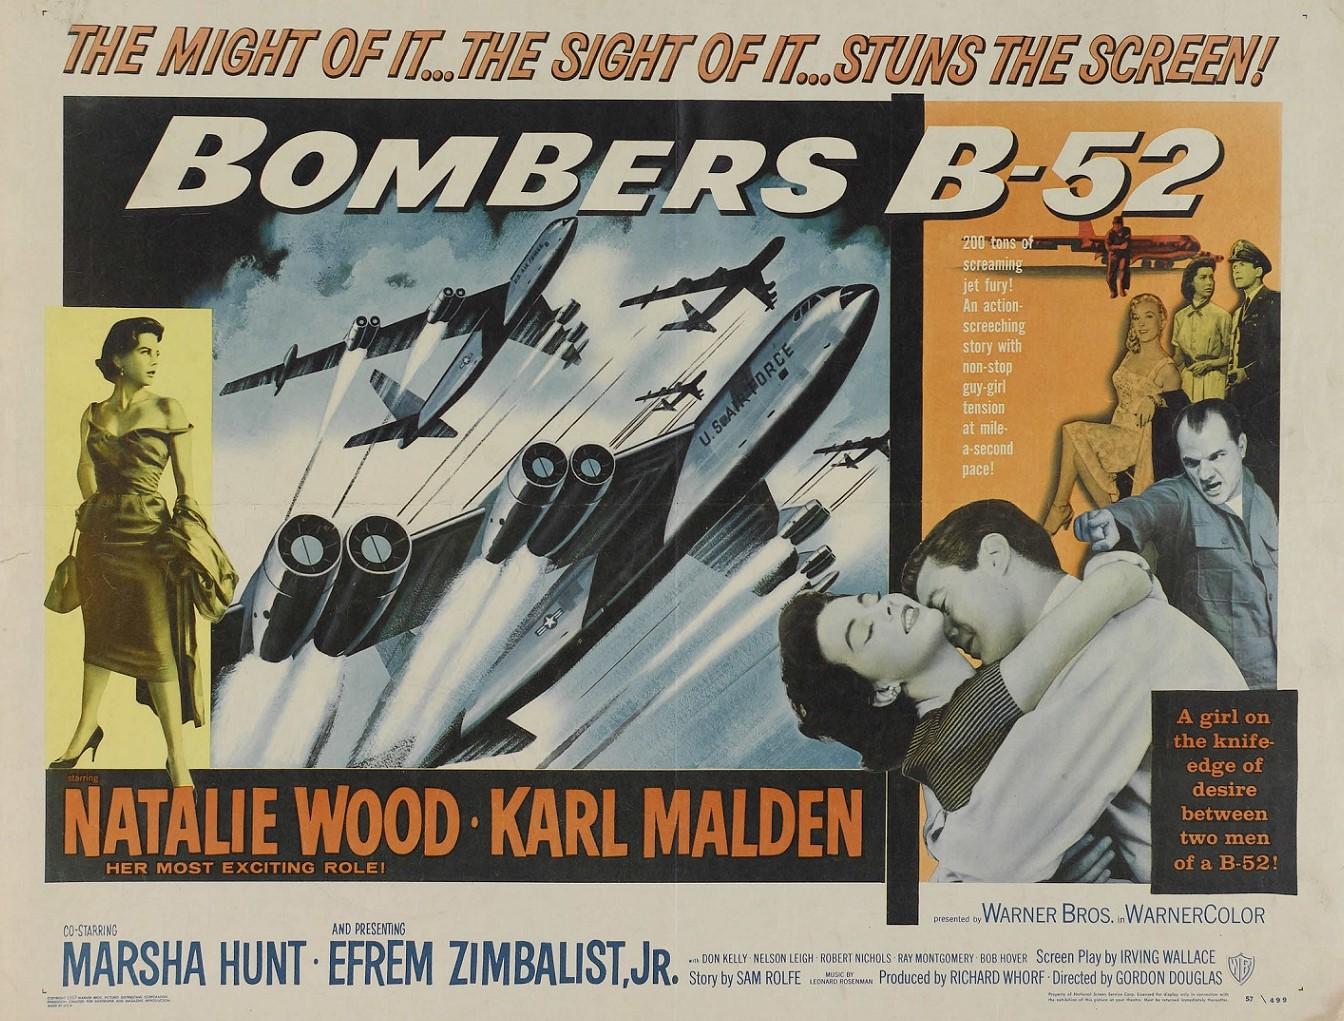 BOMBERS B-52 (1957) WEB SITE